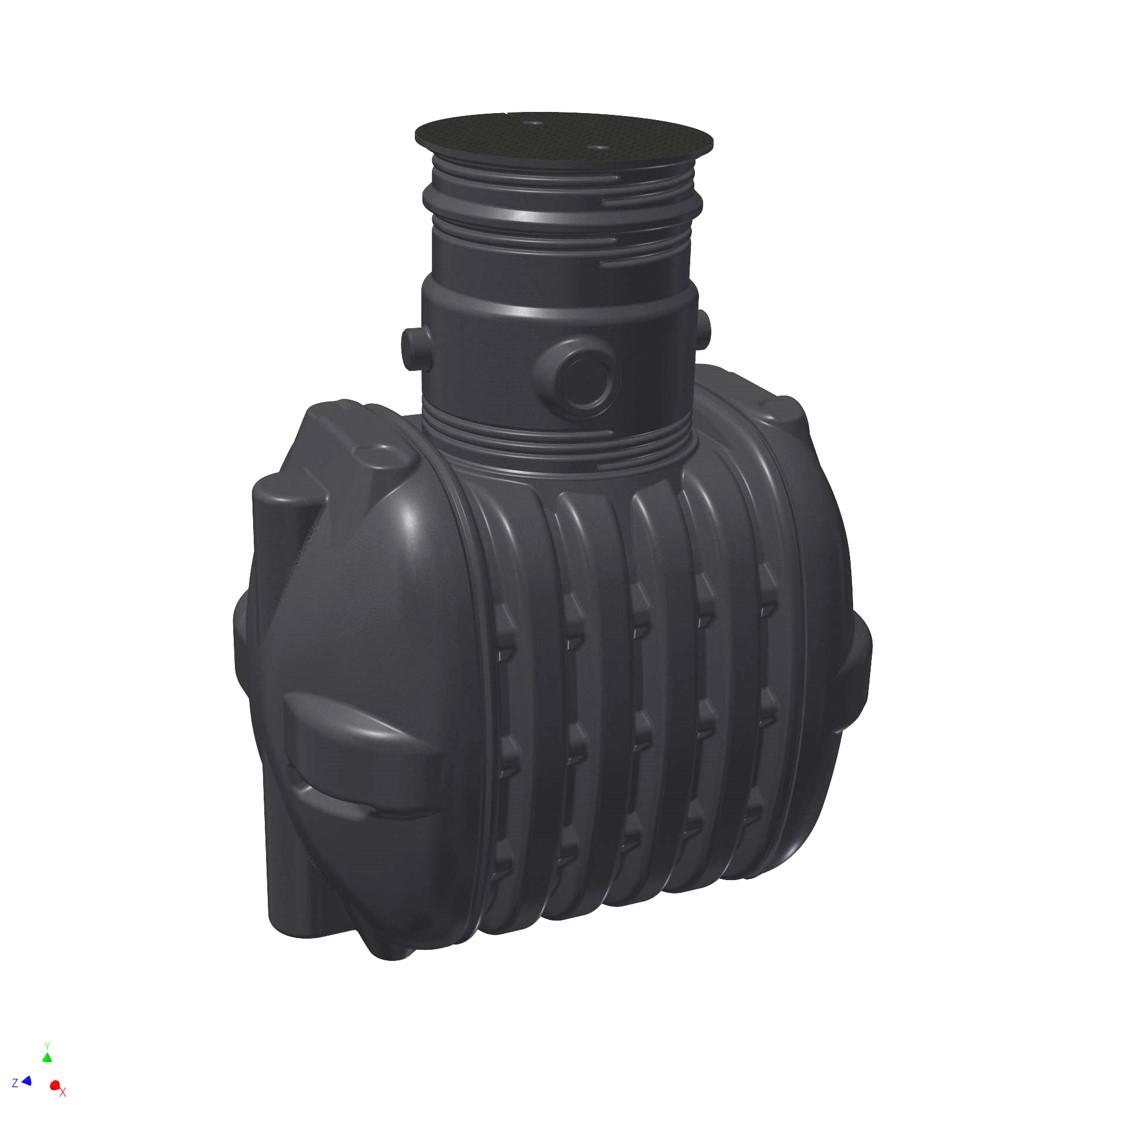 regenwasser tank zisterne erdtank speicher sl basic ebay. Black Bedroom Furniture Sets. Home Design Ideas